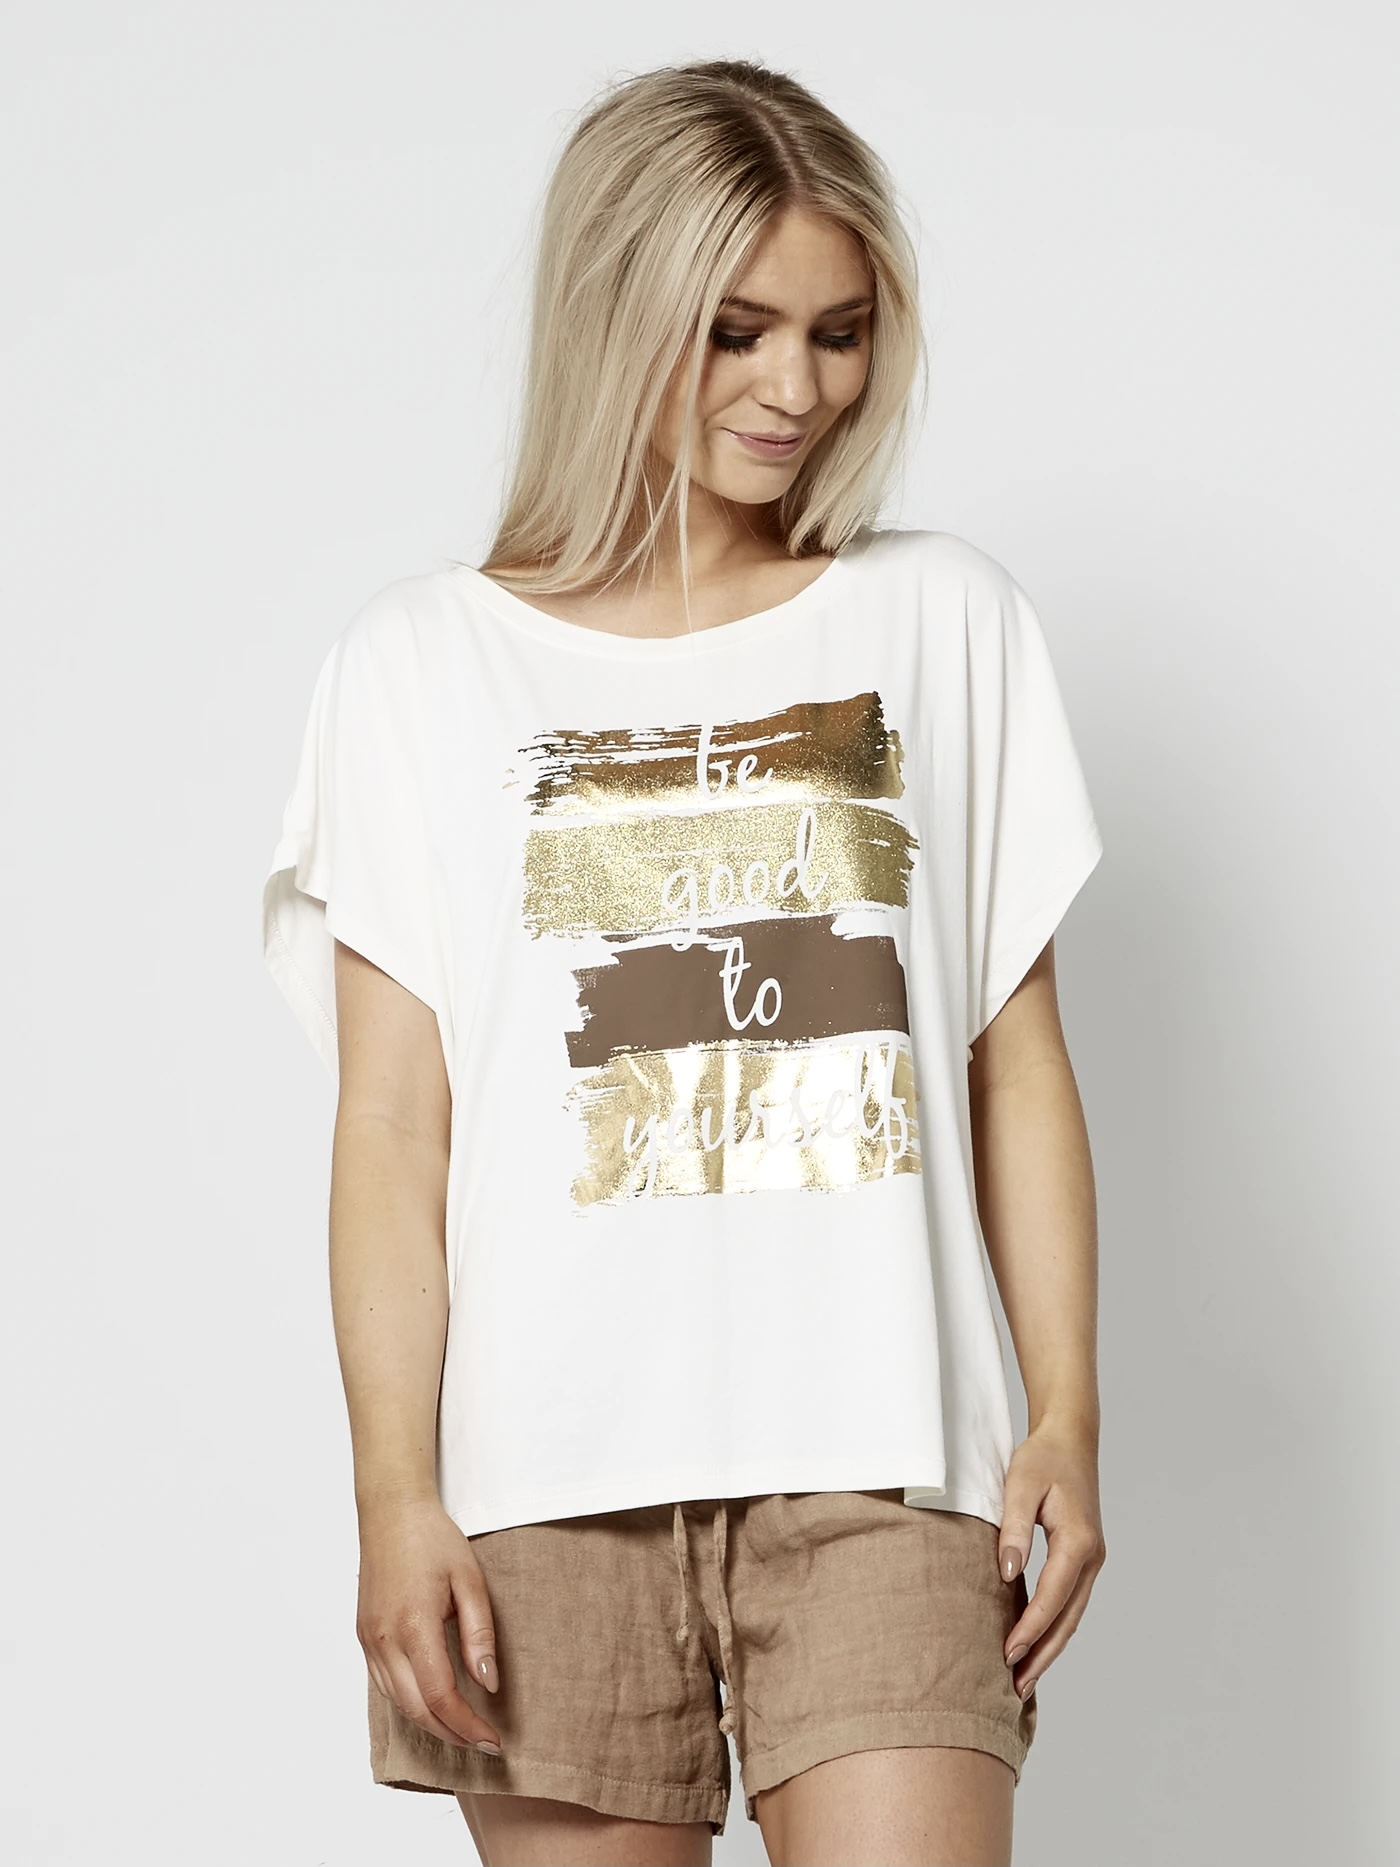 NÜ DENMARK Agnes T-shirt IMAGE BY ME